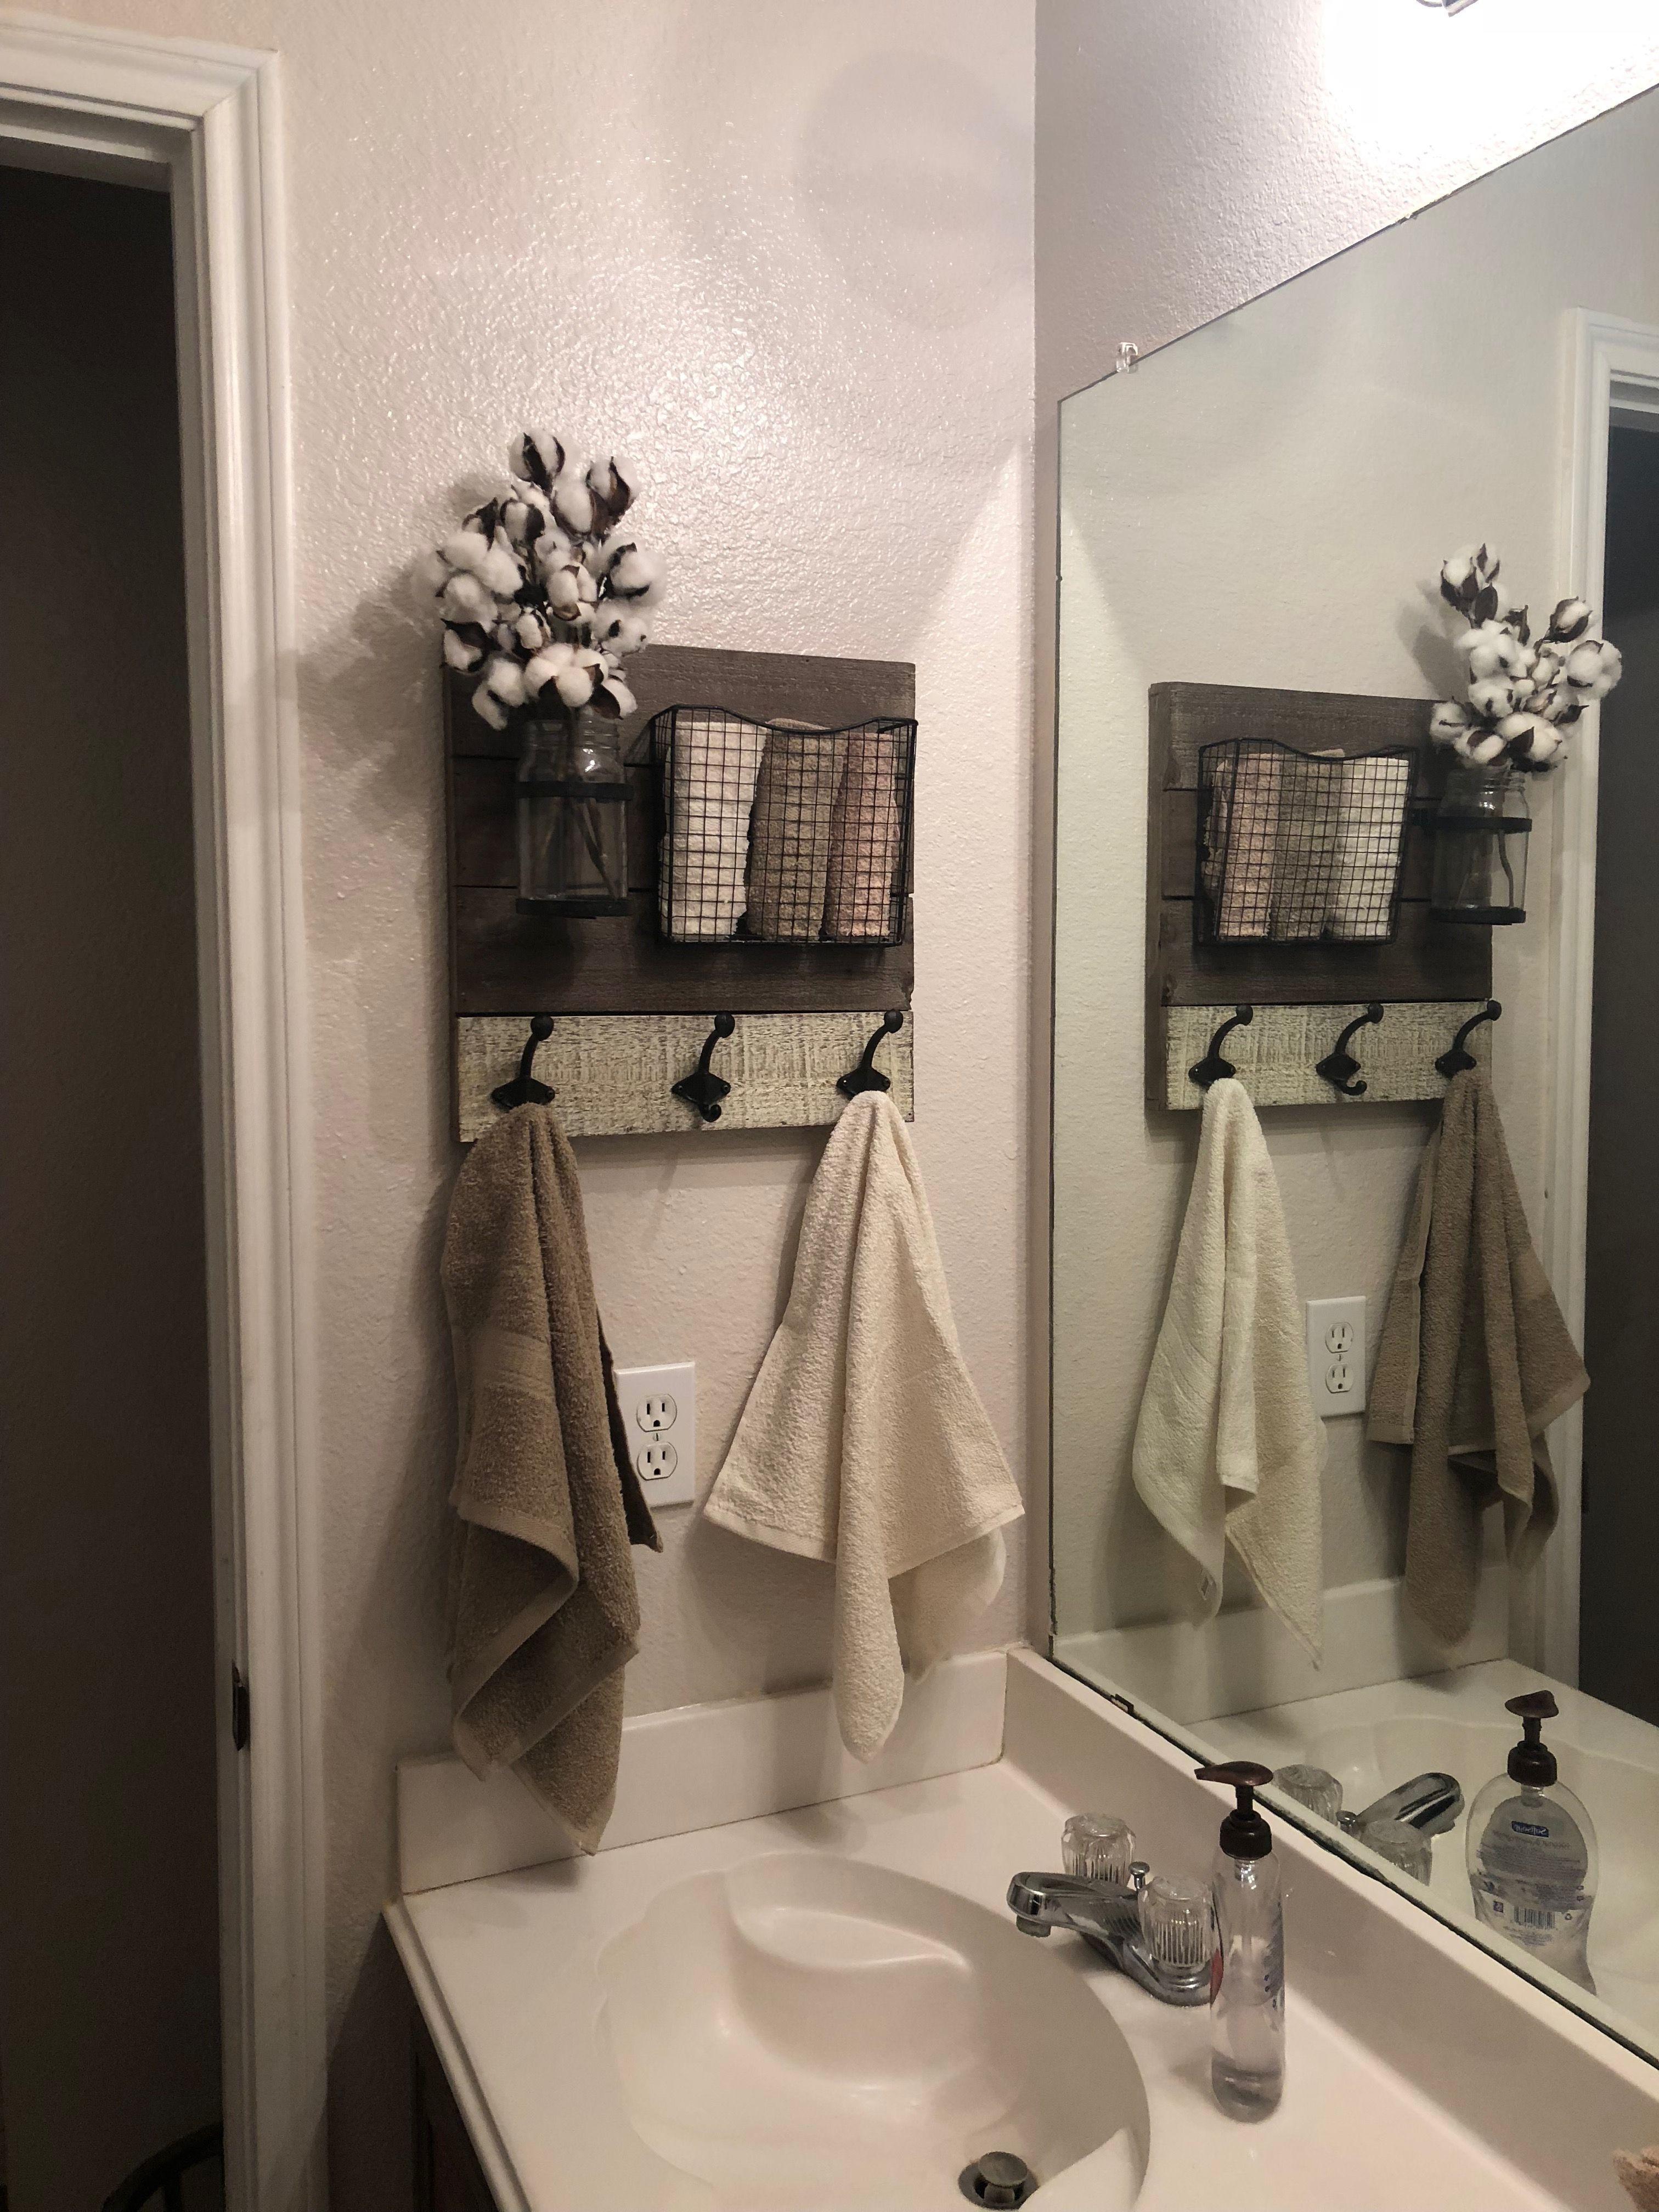 Farmhouse Bathroom Wall Organizer And Towel Holder Cottage